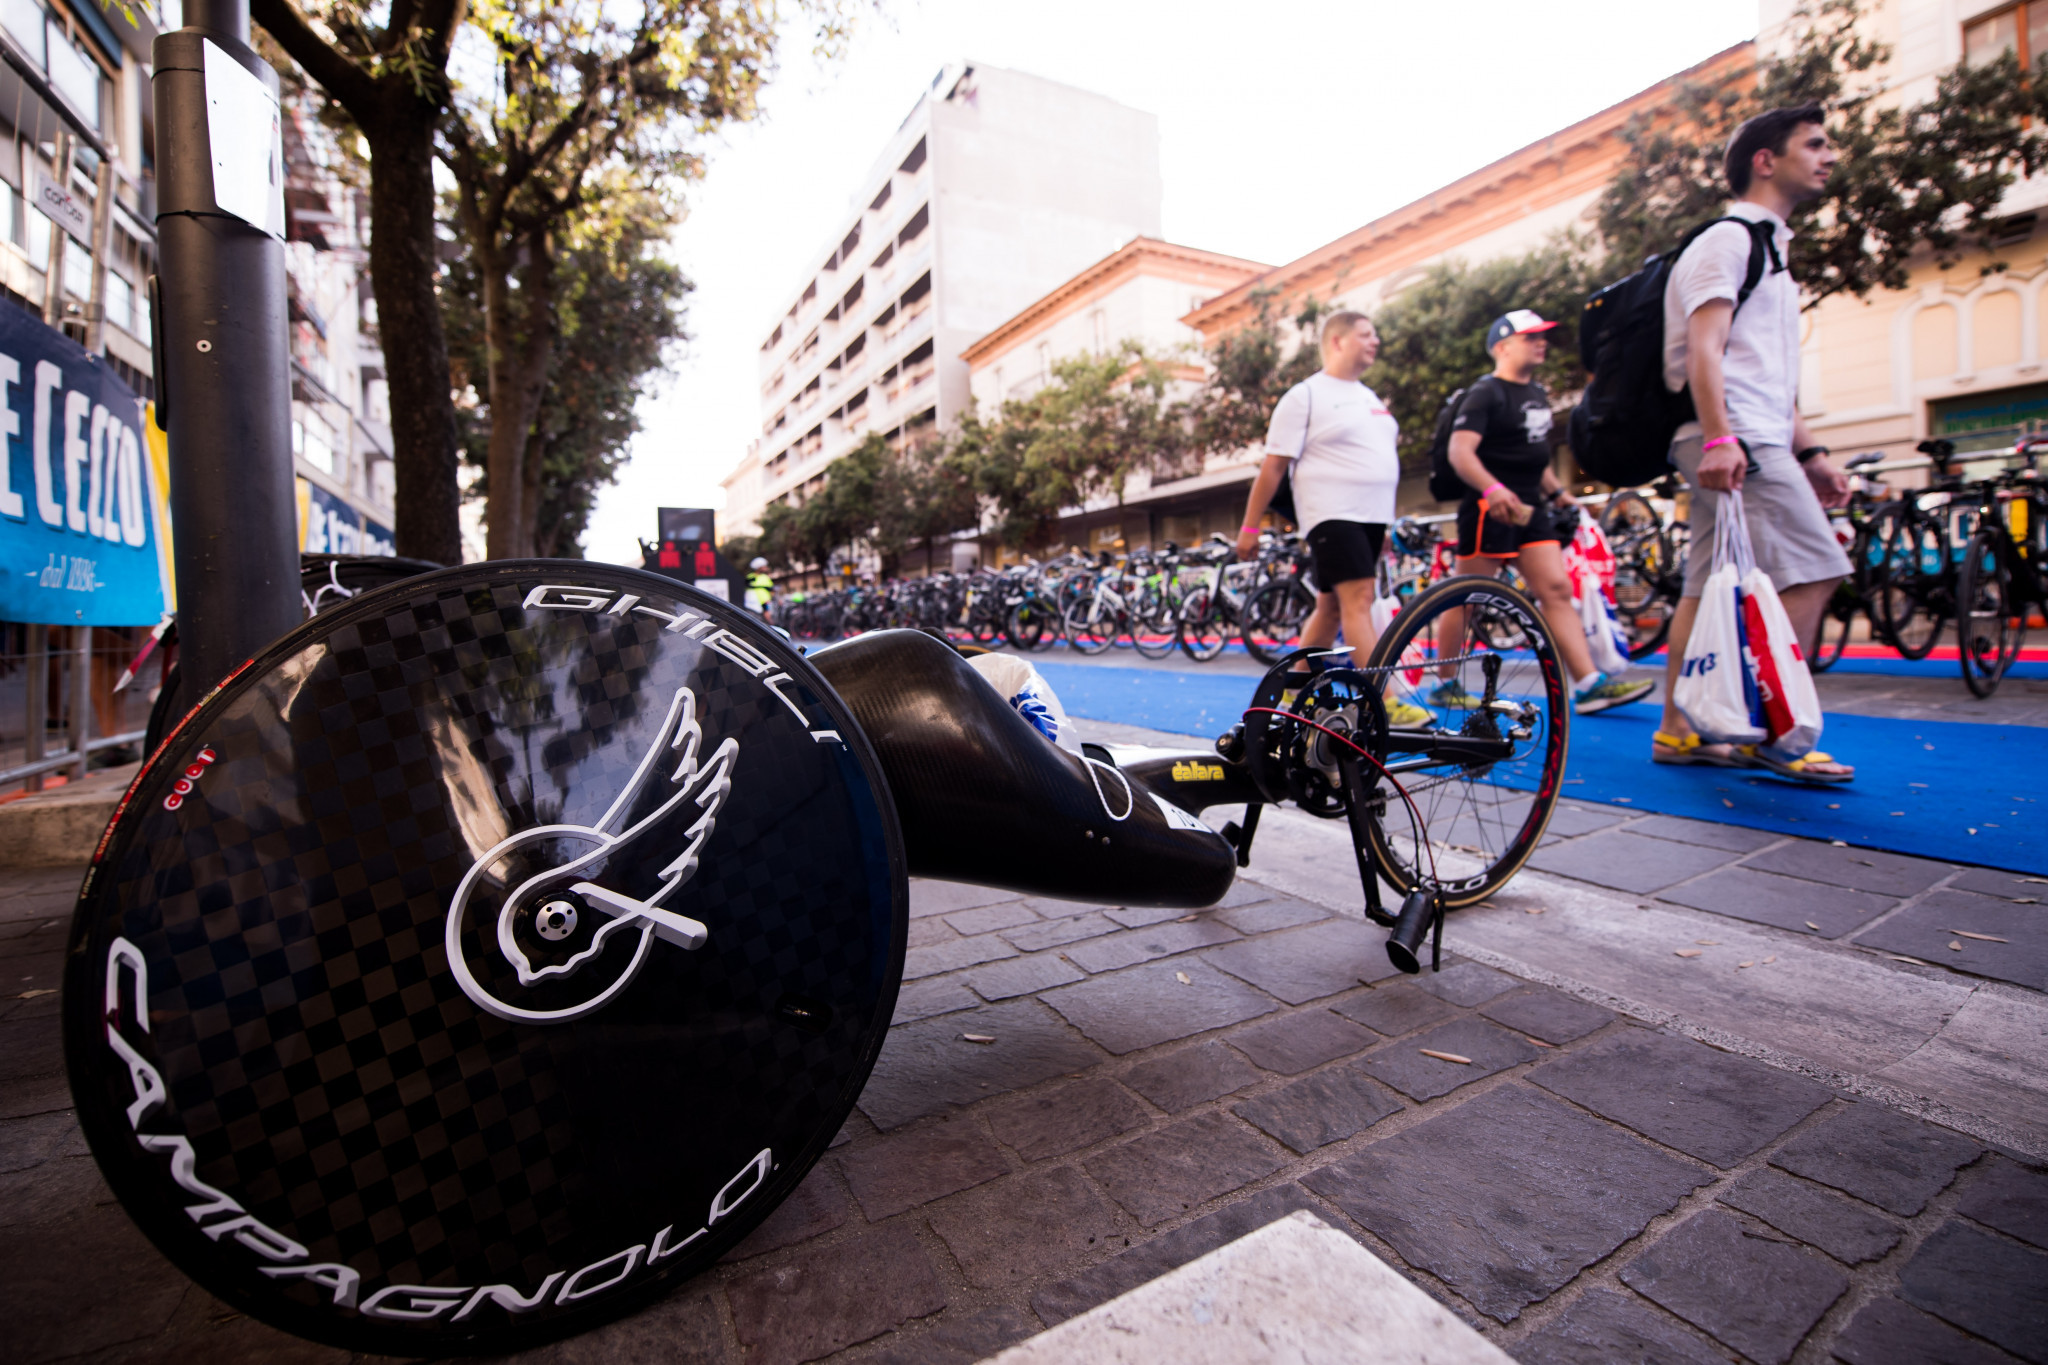 Three-time Giro d'Italia handbike champion Conti dies after training accident